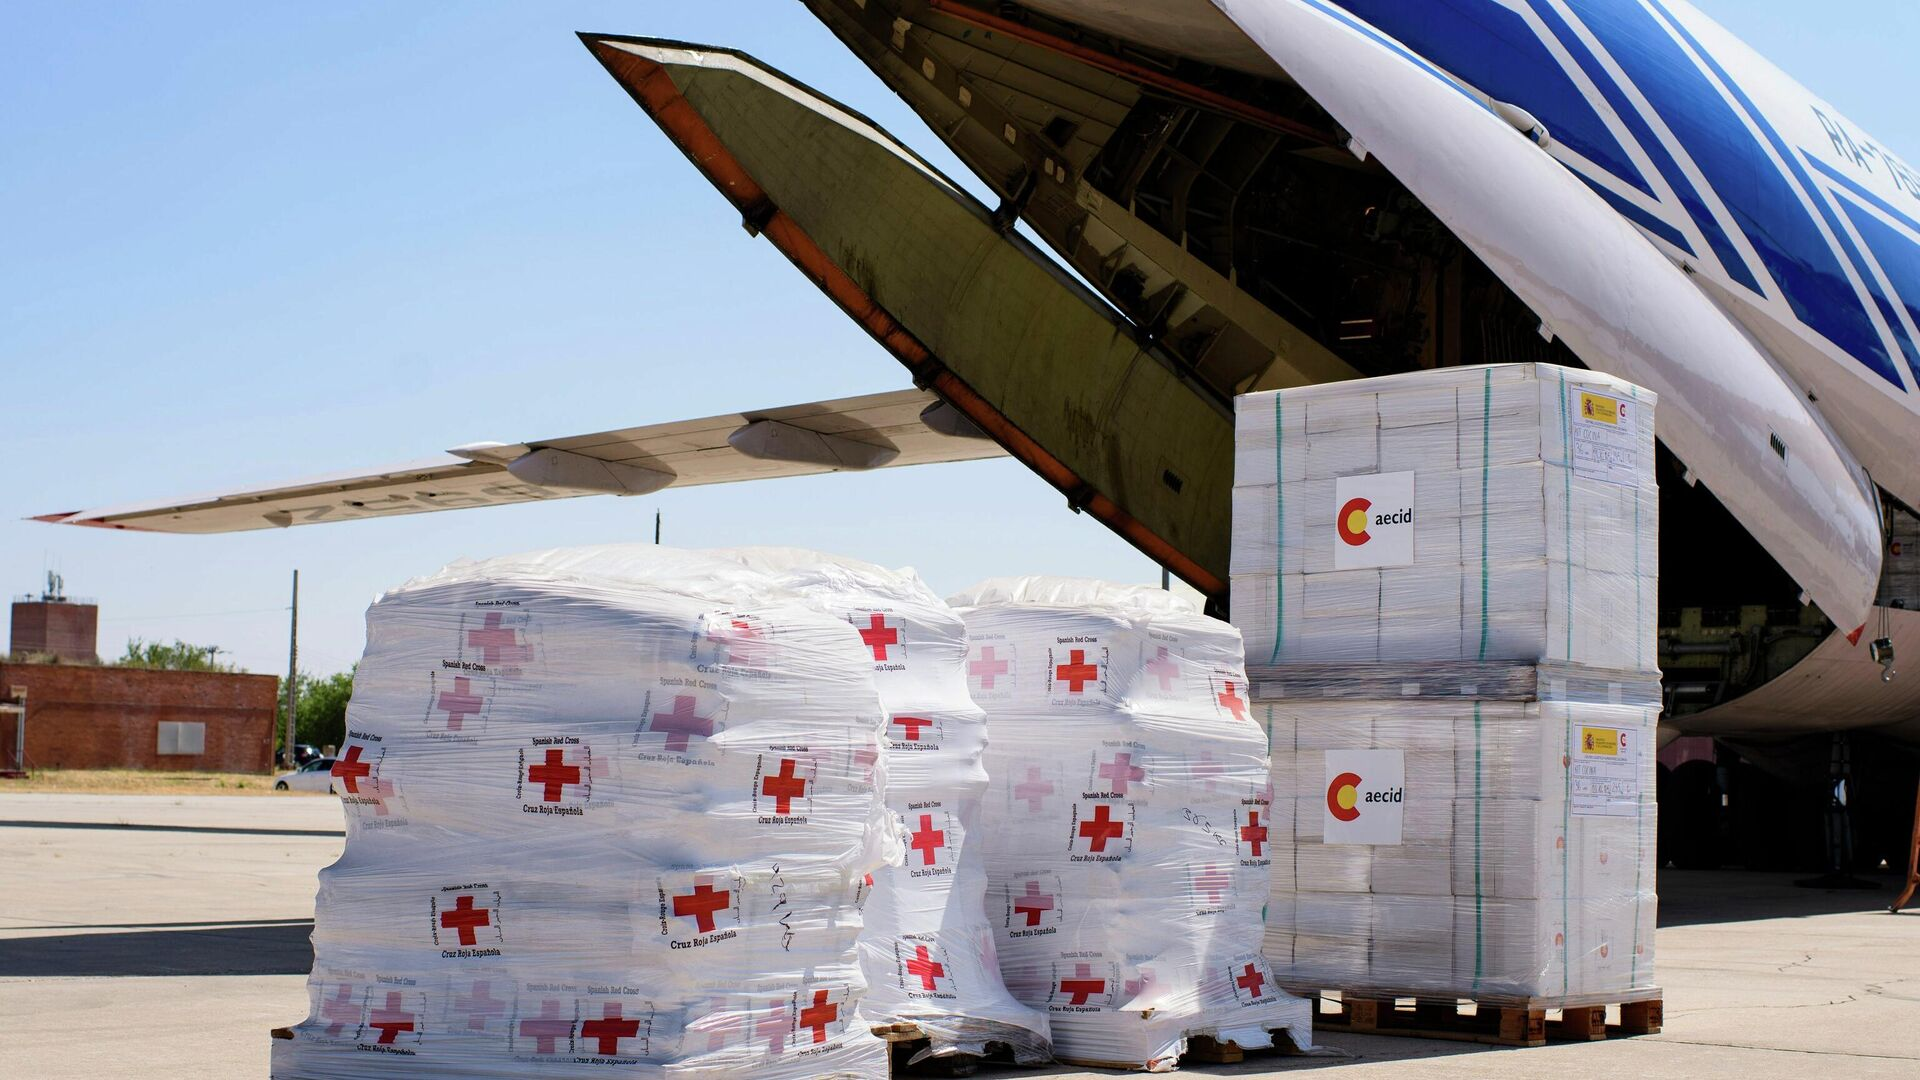 Ayuda humanitaria de España a Haití - Sputnik Mundo, 1920, 20.08.2021